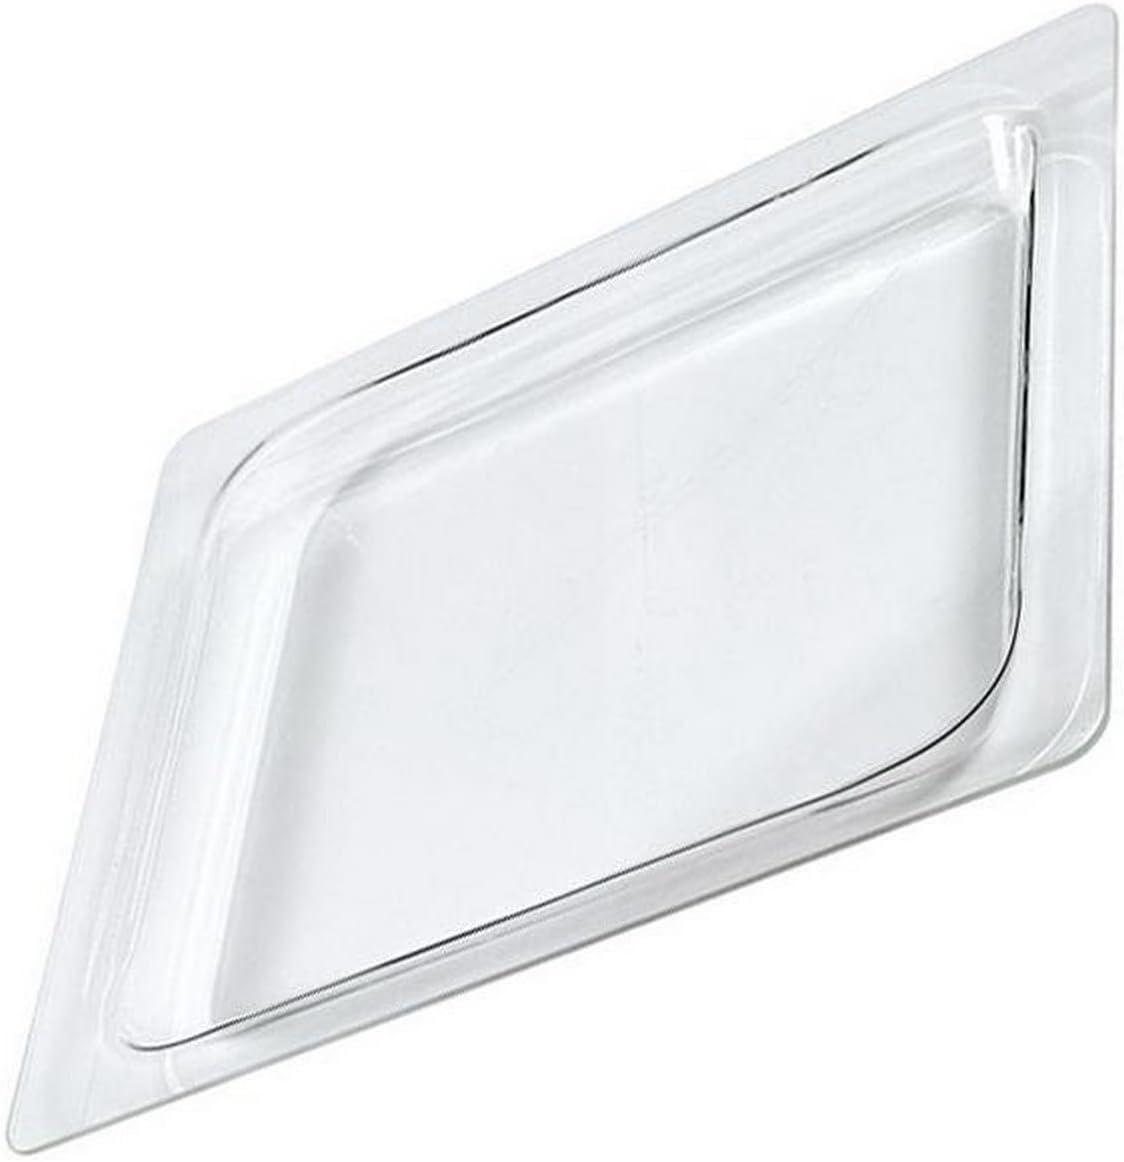 Dietrich - Bandeja rectangular de cristal (400 x 325 mm) para microondas (79 x 7440 cm)